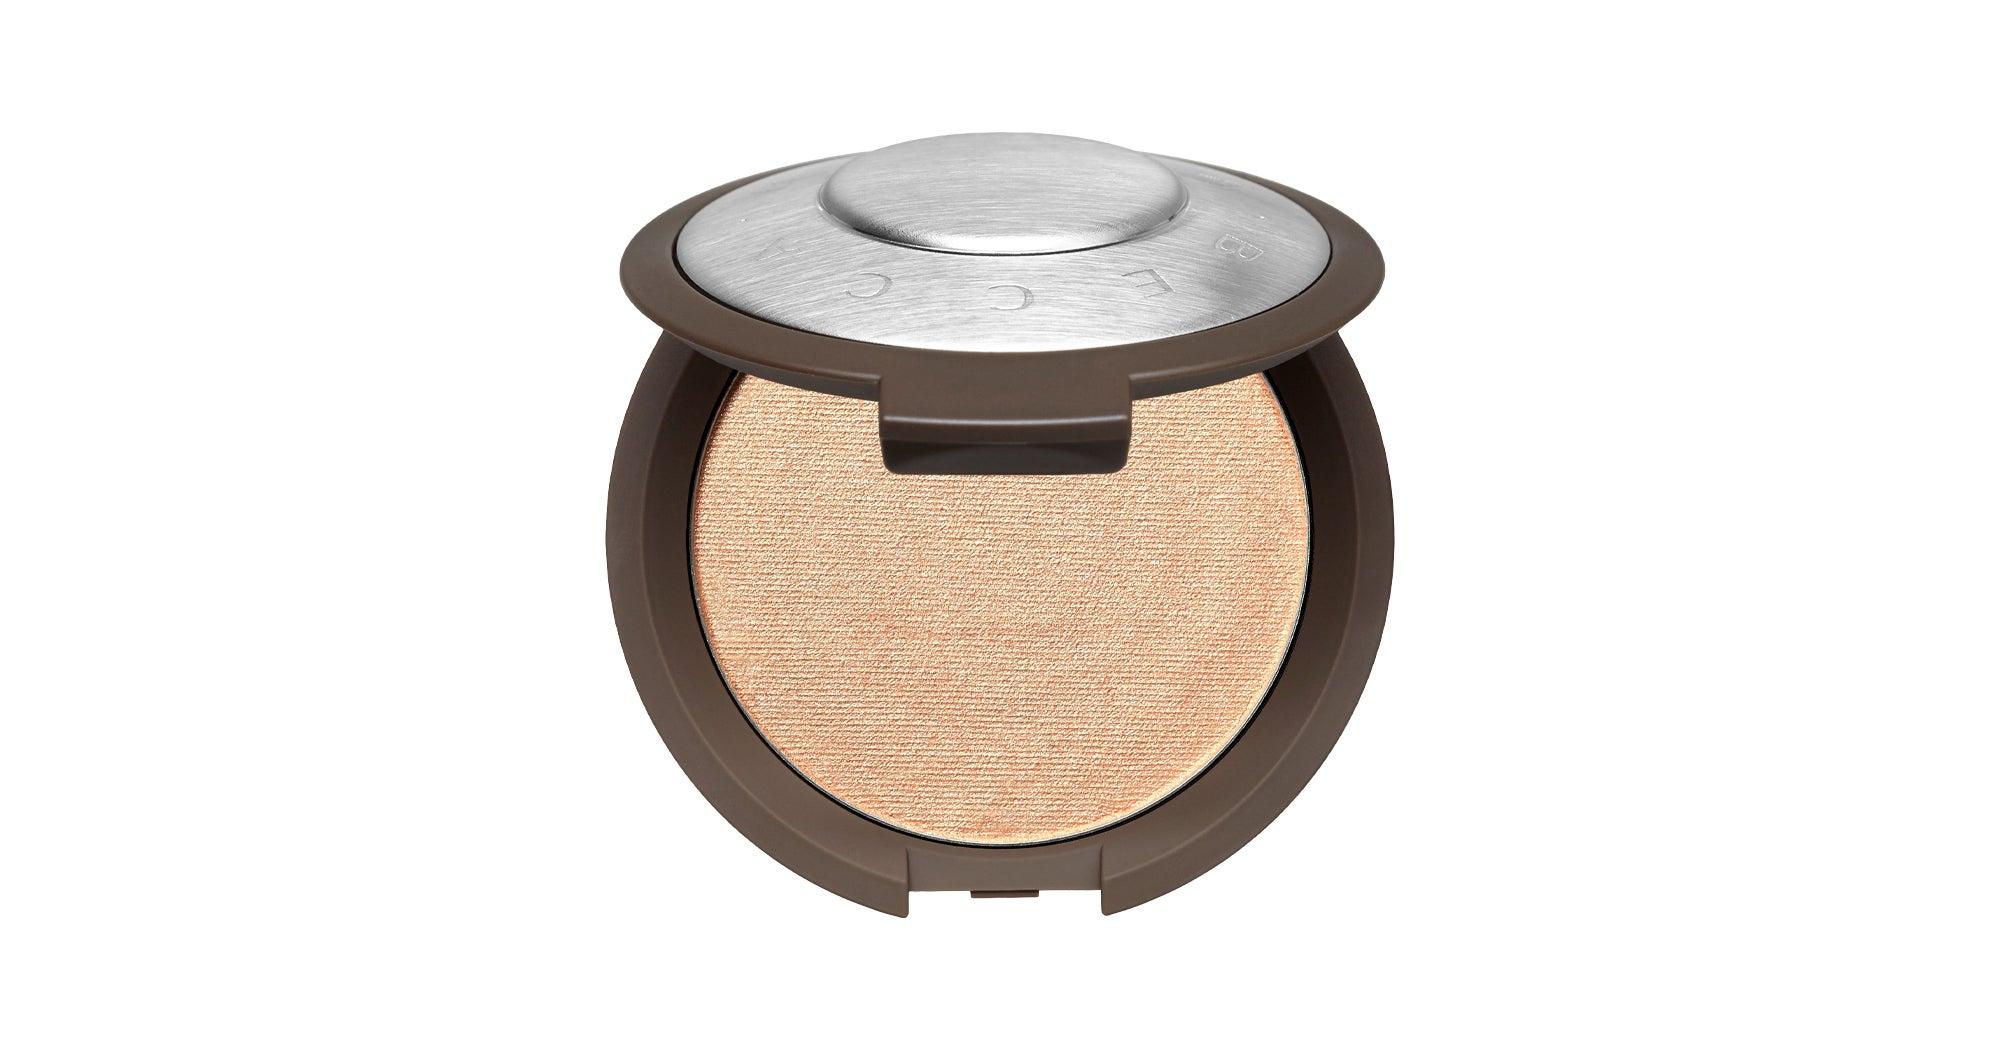 www.refinery29.com: Becca Cosmetics Announces Brand Is Closing Due To COVID